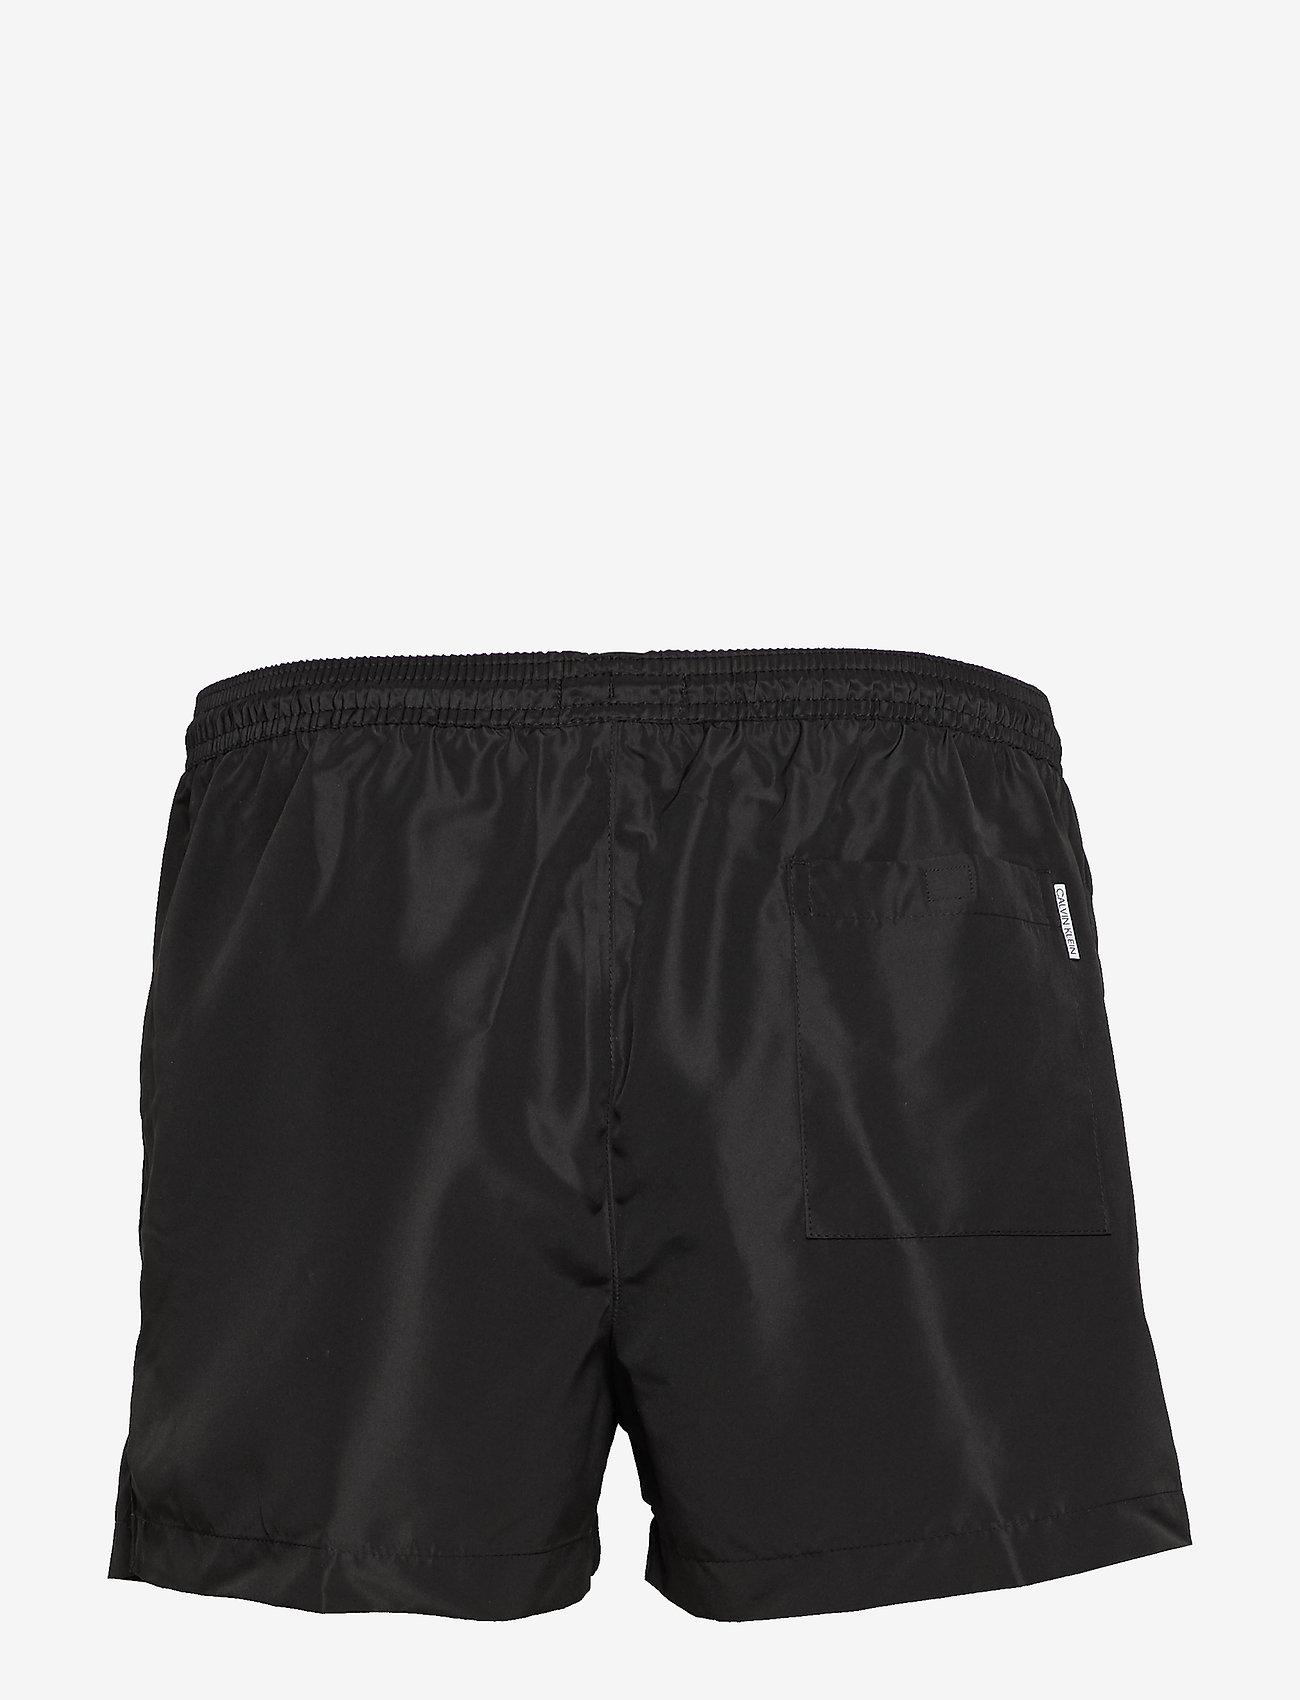 Calvin Klein - SHORT DRAWSTRING - badehosen - pvh black - 1